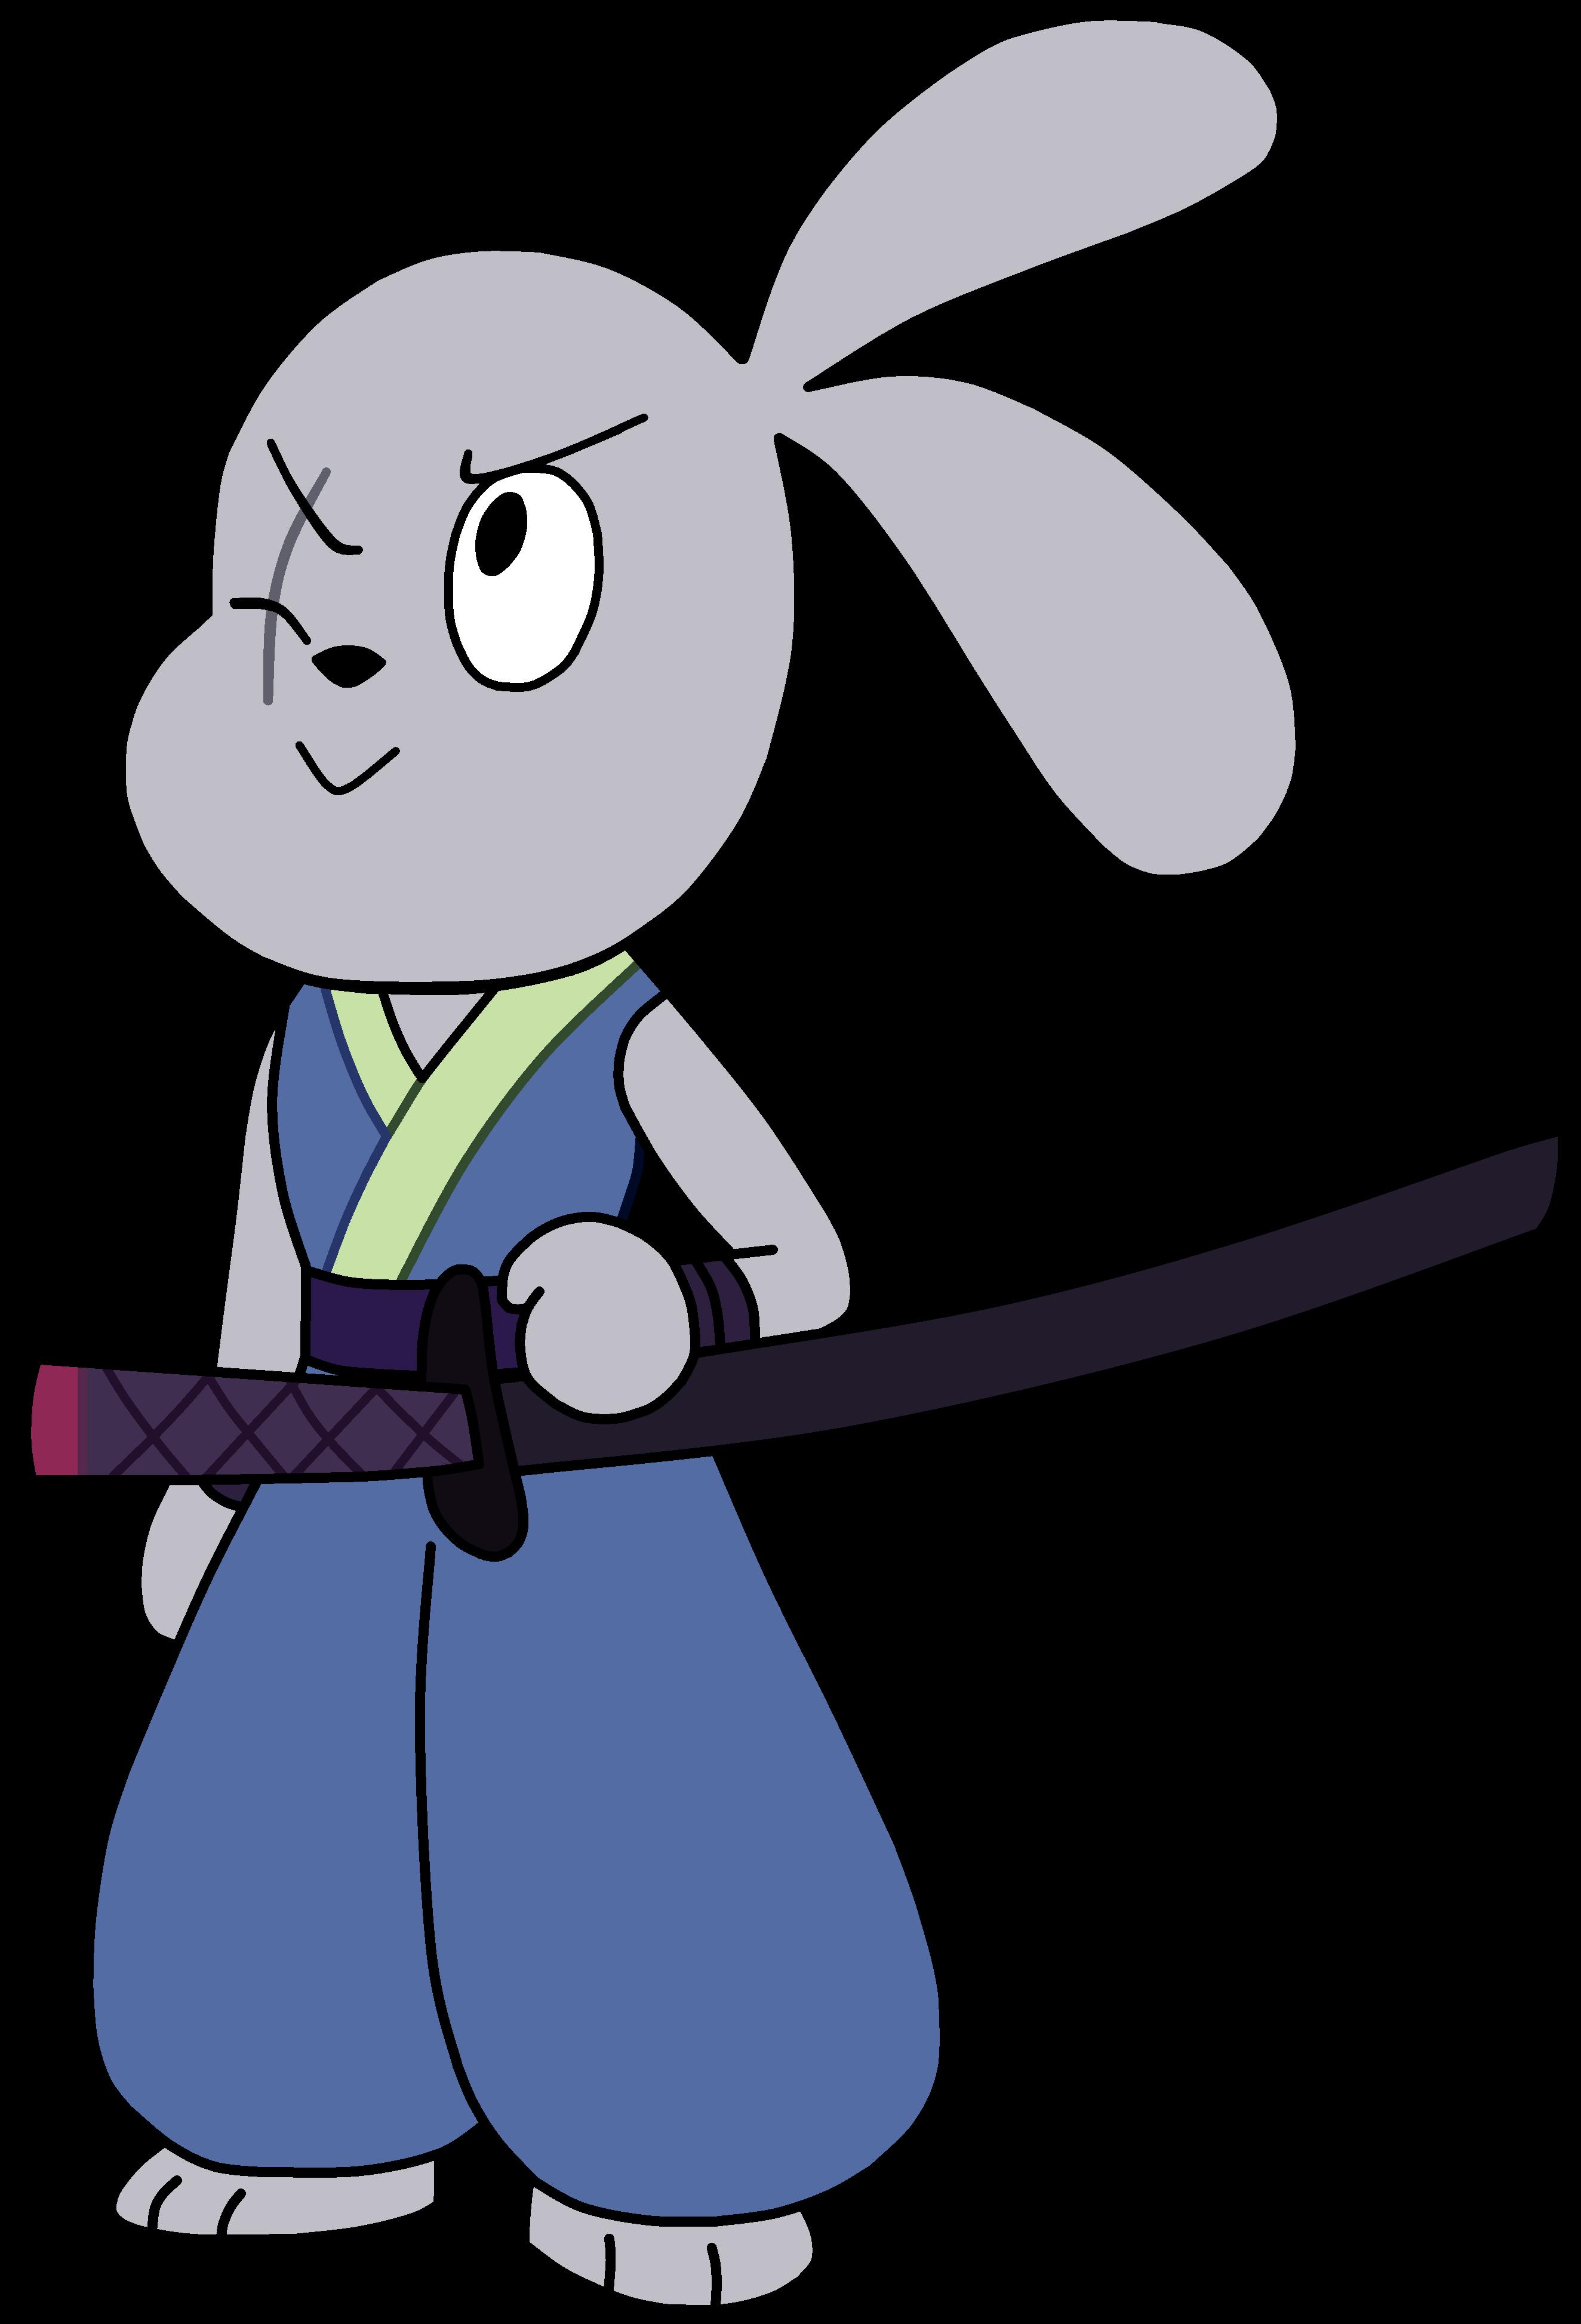 Hoppy steven universe wiki. Tooth clipart bunny